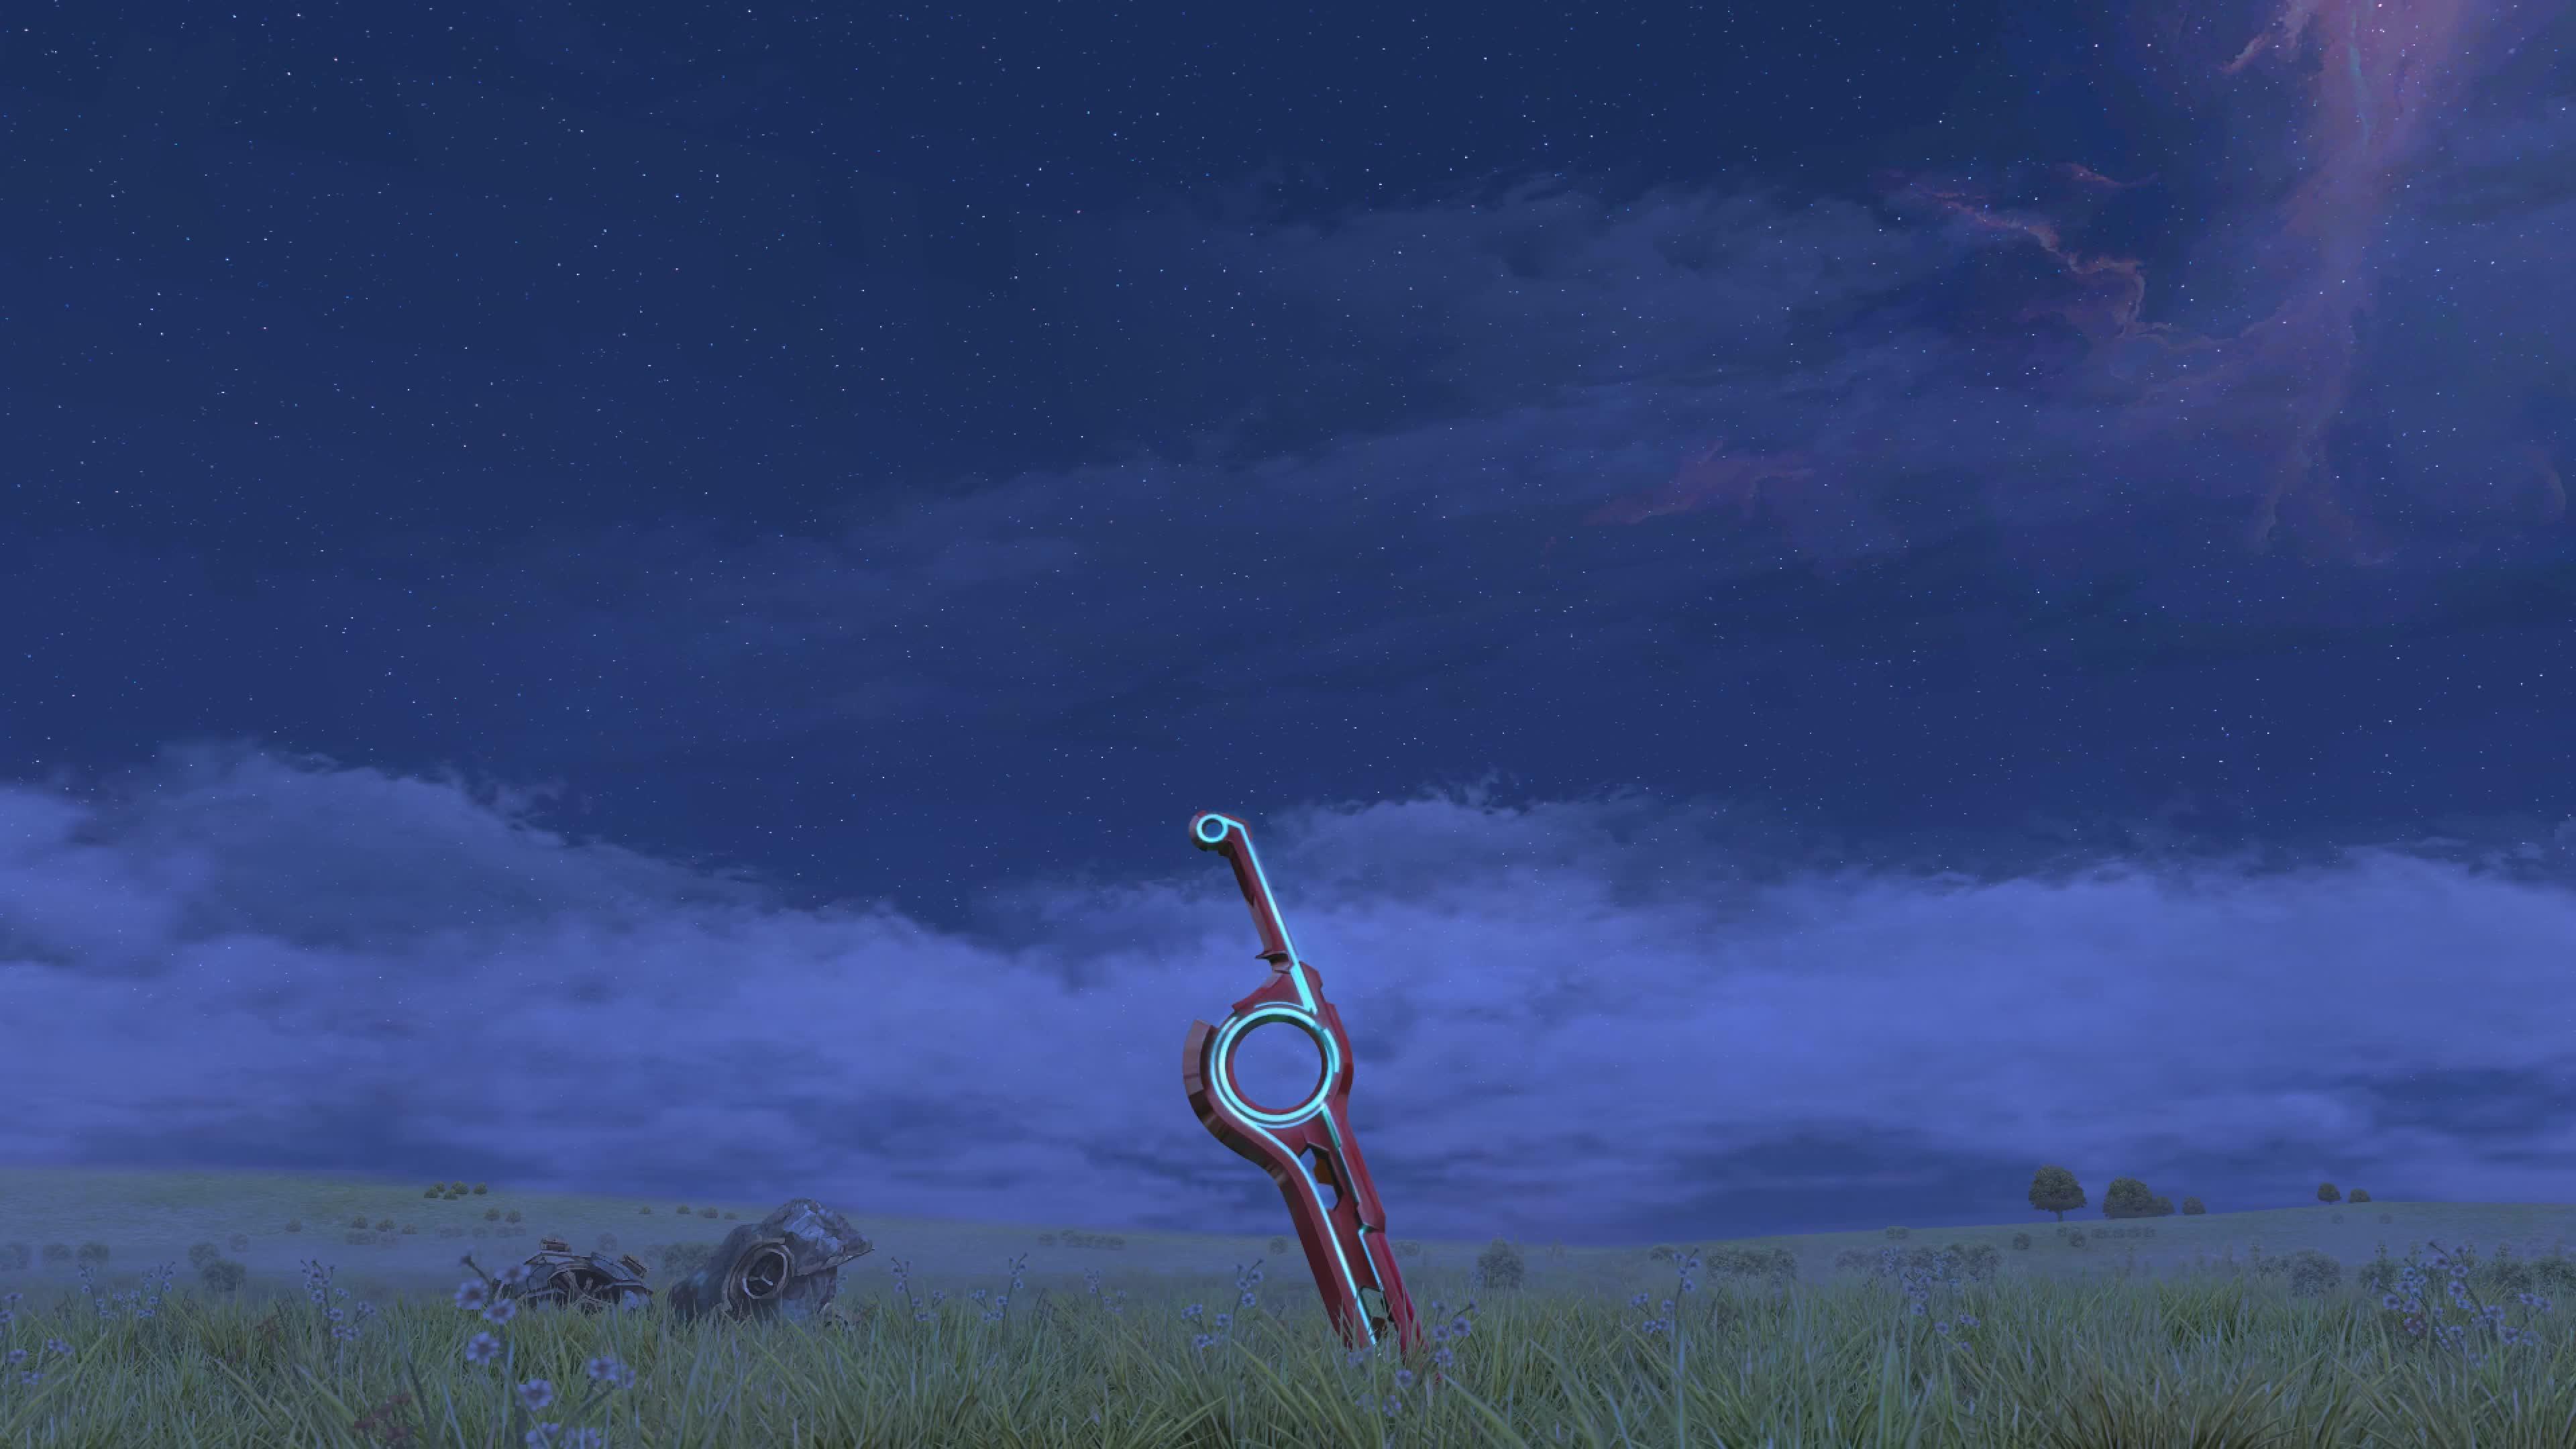 Gaming, frinalal, Xenoblade Chronicles start screen loop 4K GIFs